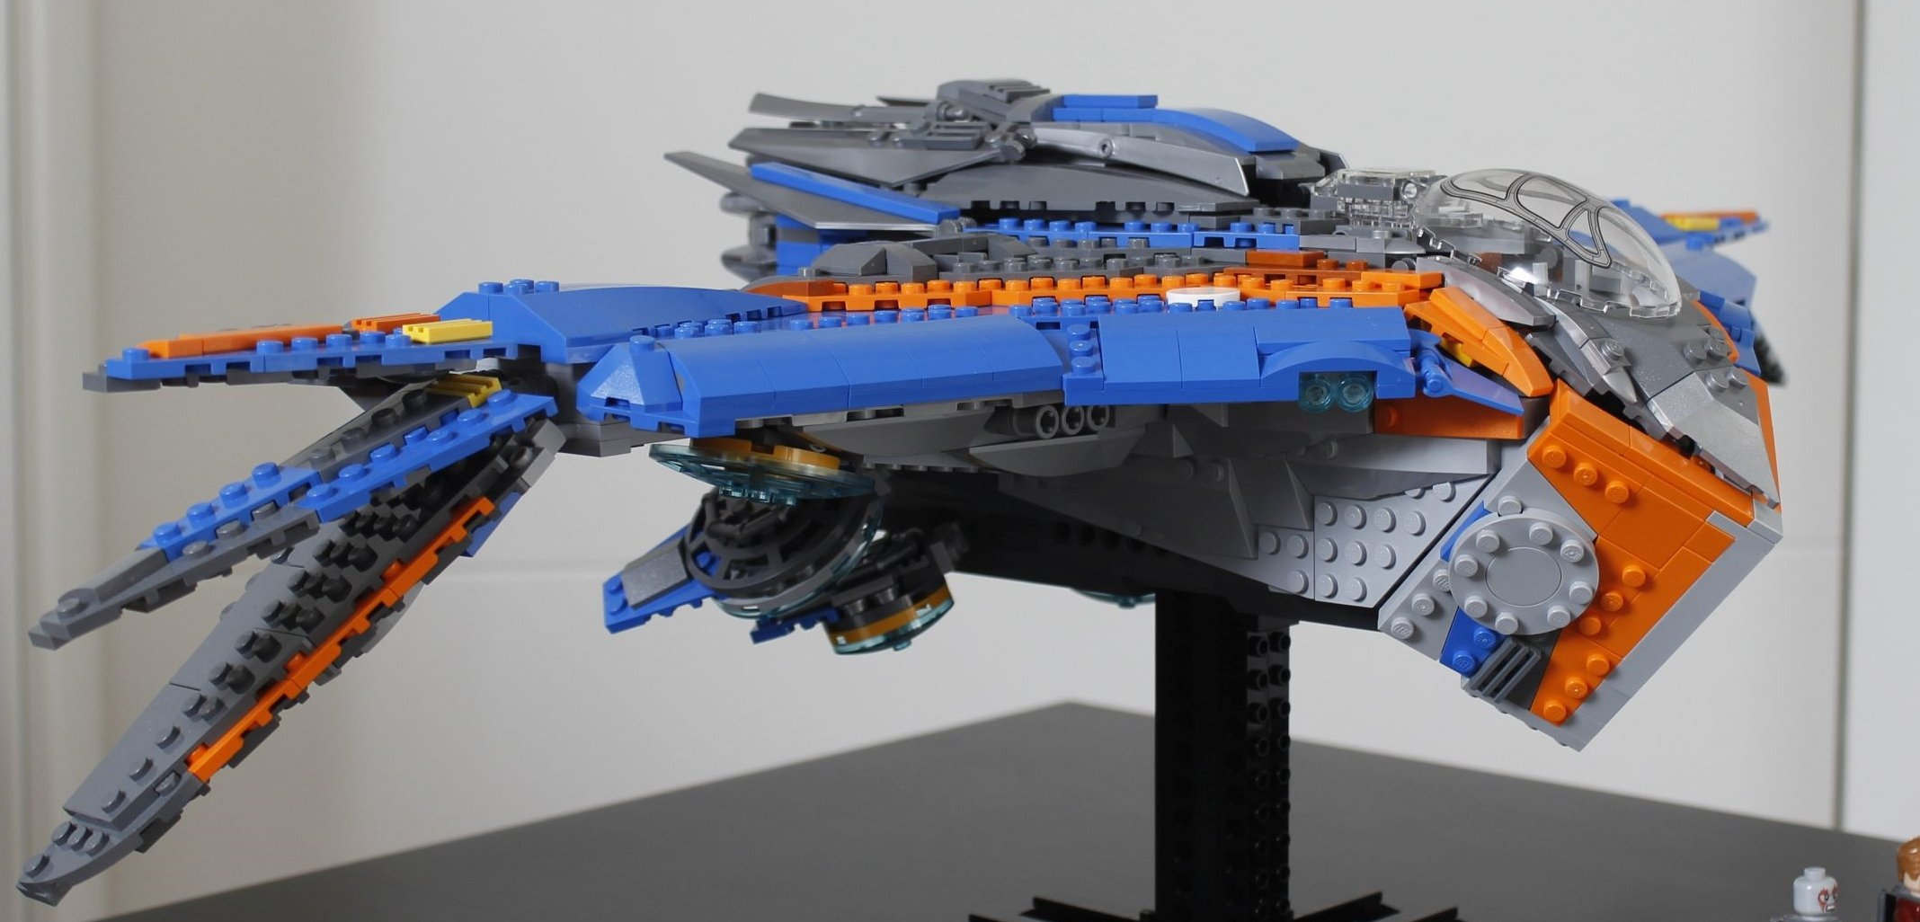 LEGO Building Toys Build a Custom LEGO Guardians of Galaxy UCS Style